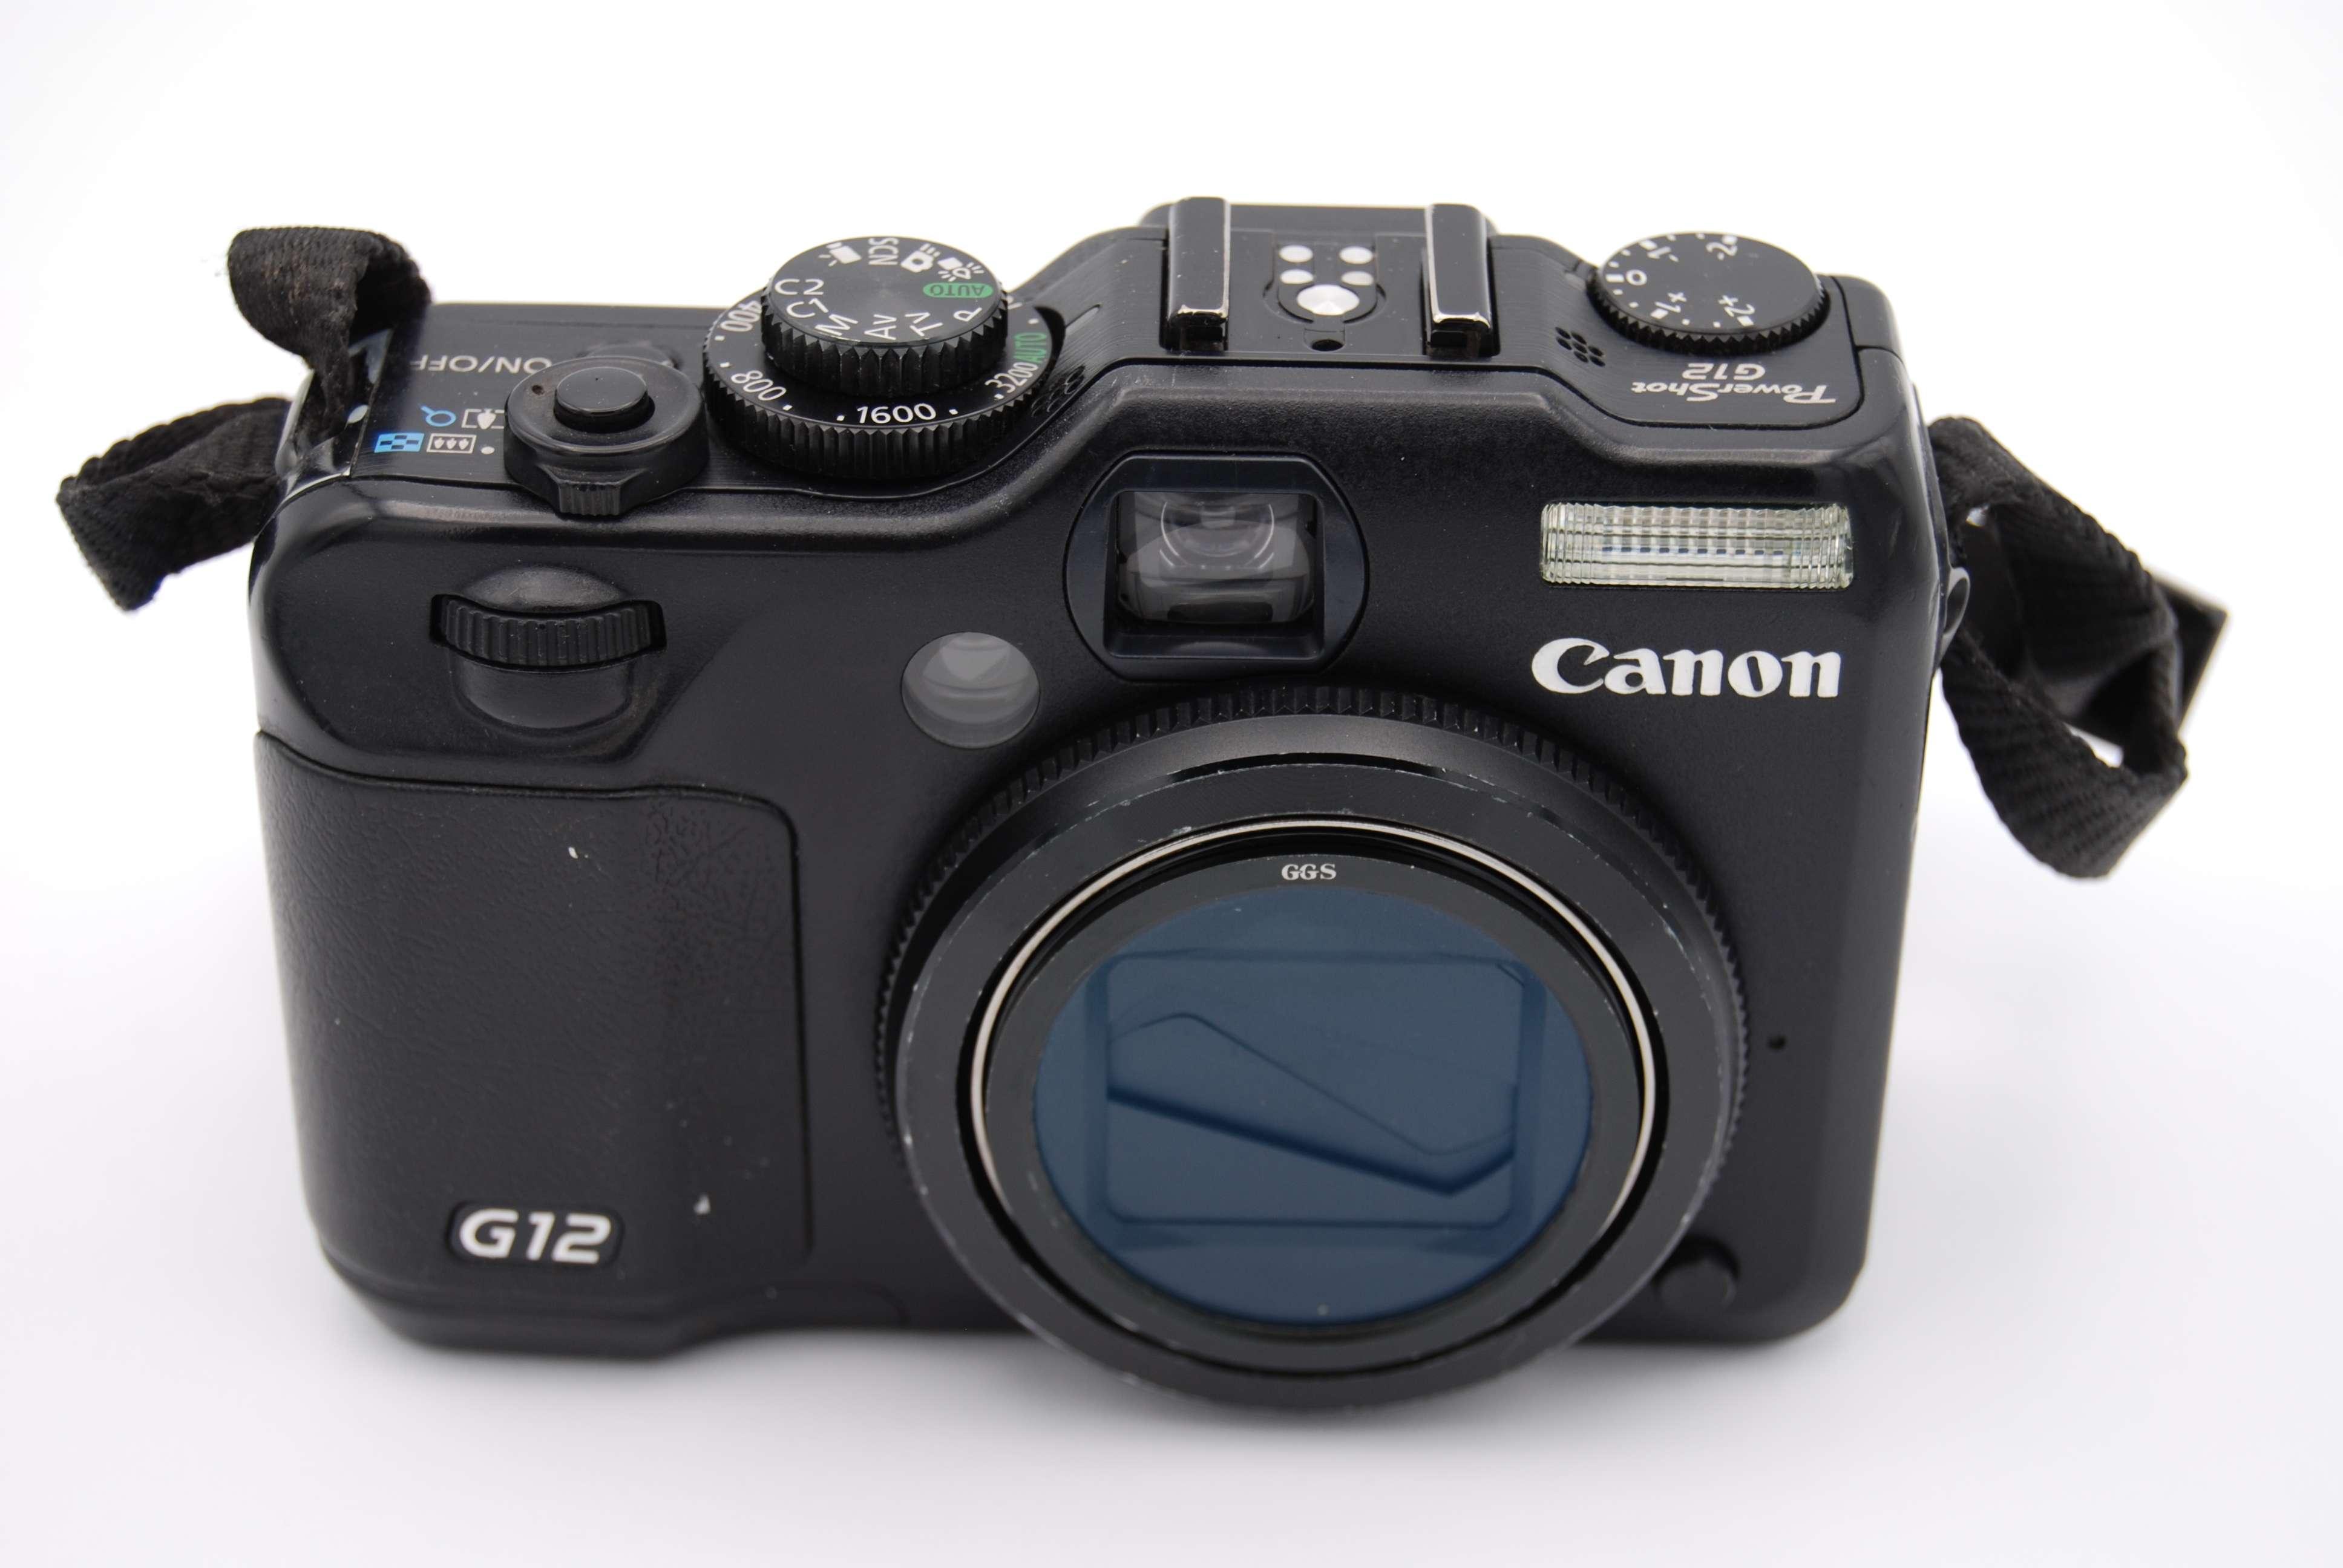 canon powershot g12 10 0 mp digital camera black. Black Bedroom Furniture Sets. Home Design Ideas